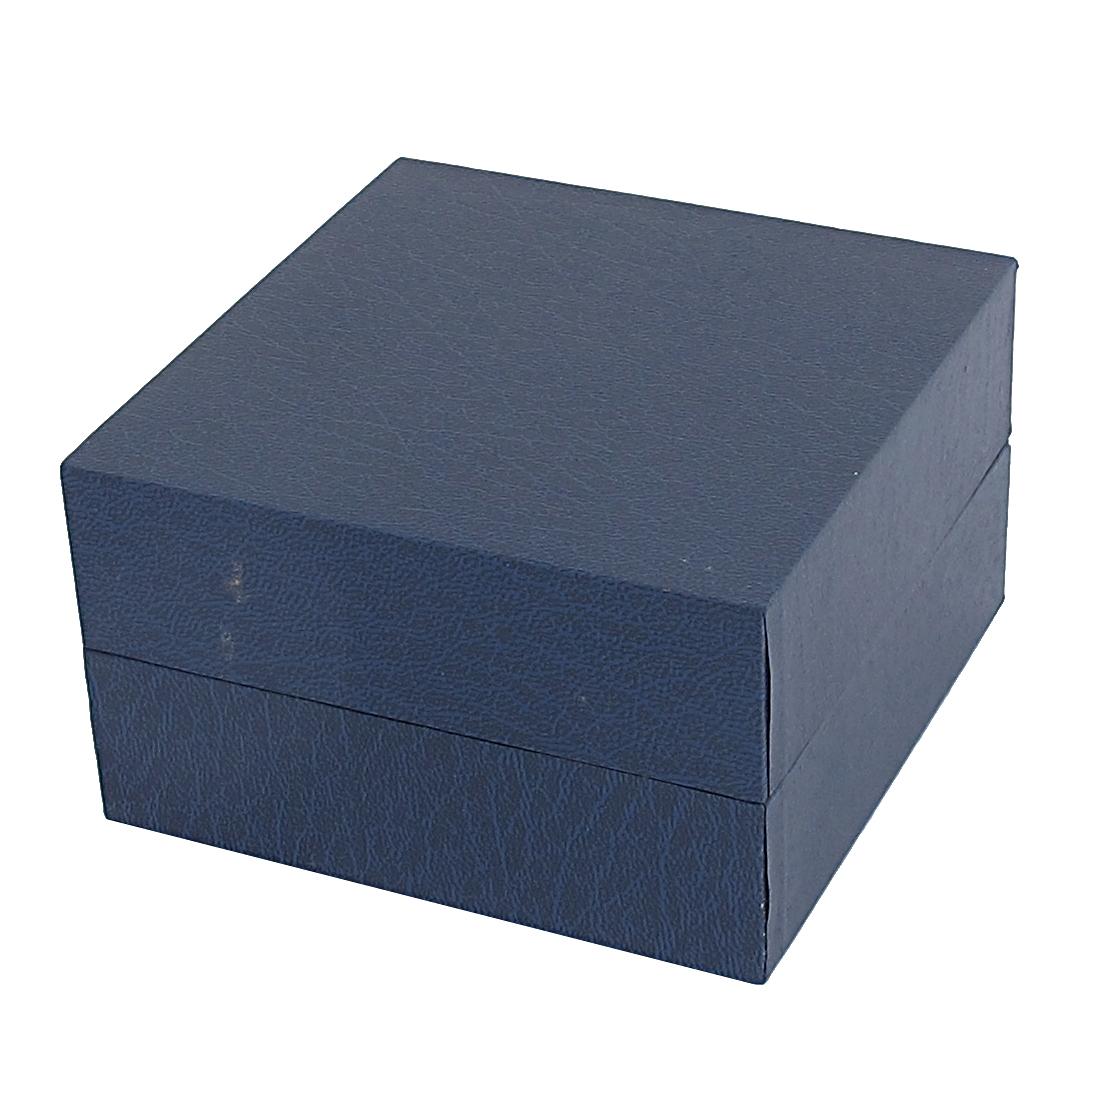 Dark Blue Rectangle Shape Cardboard Watch Holder Box Casket Case Containner